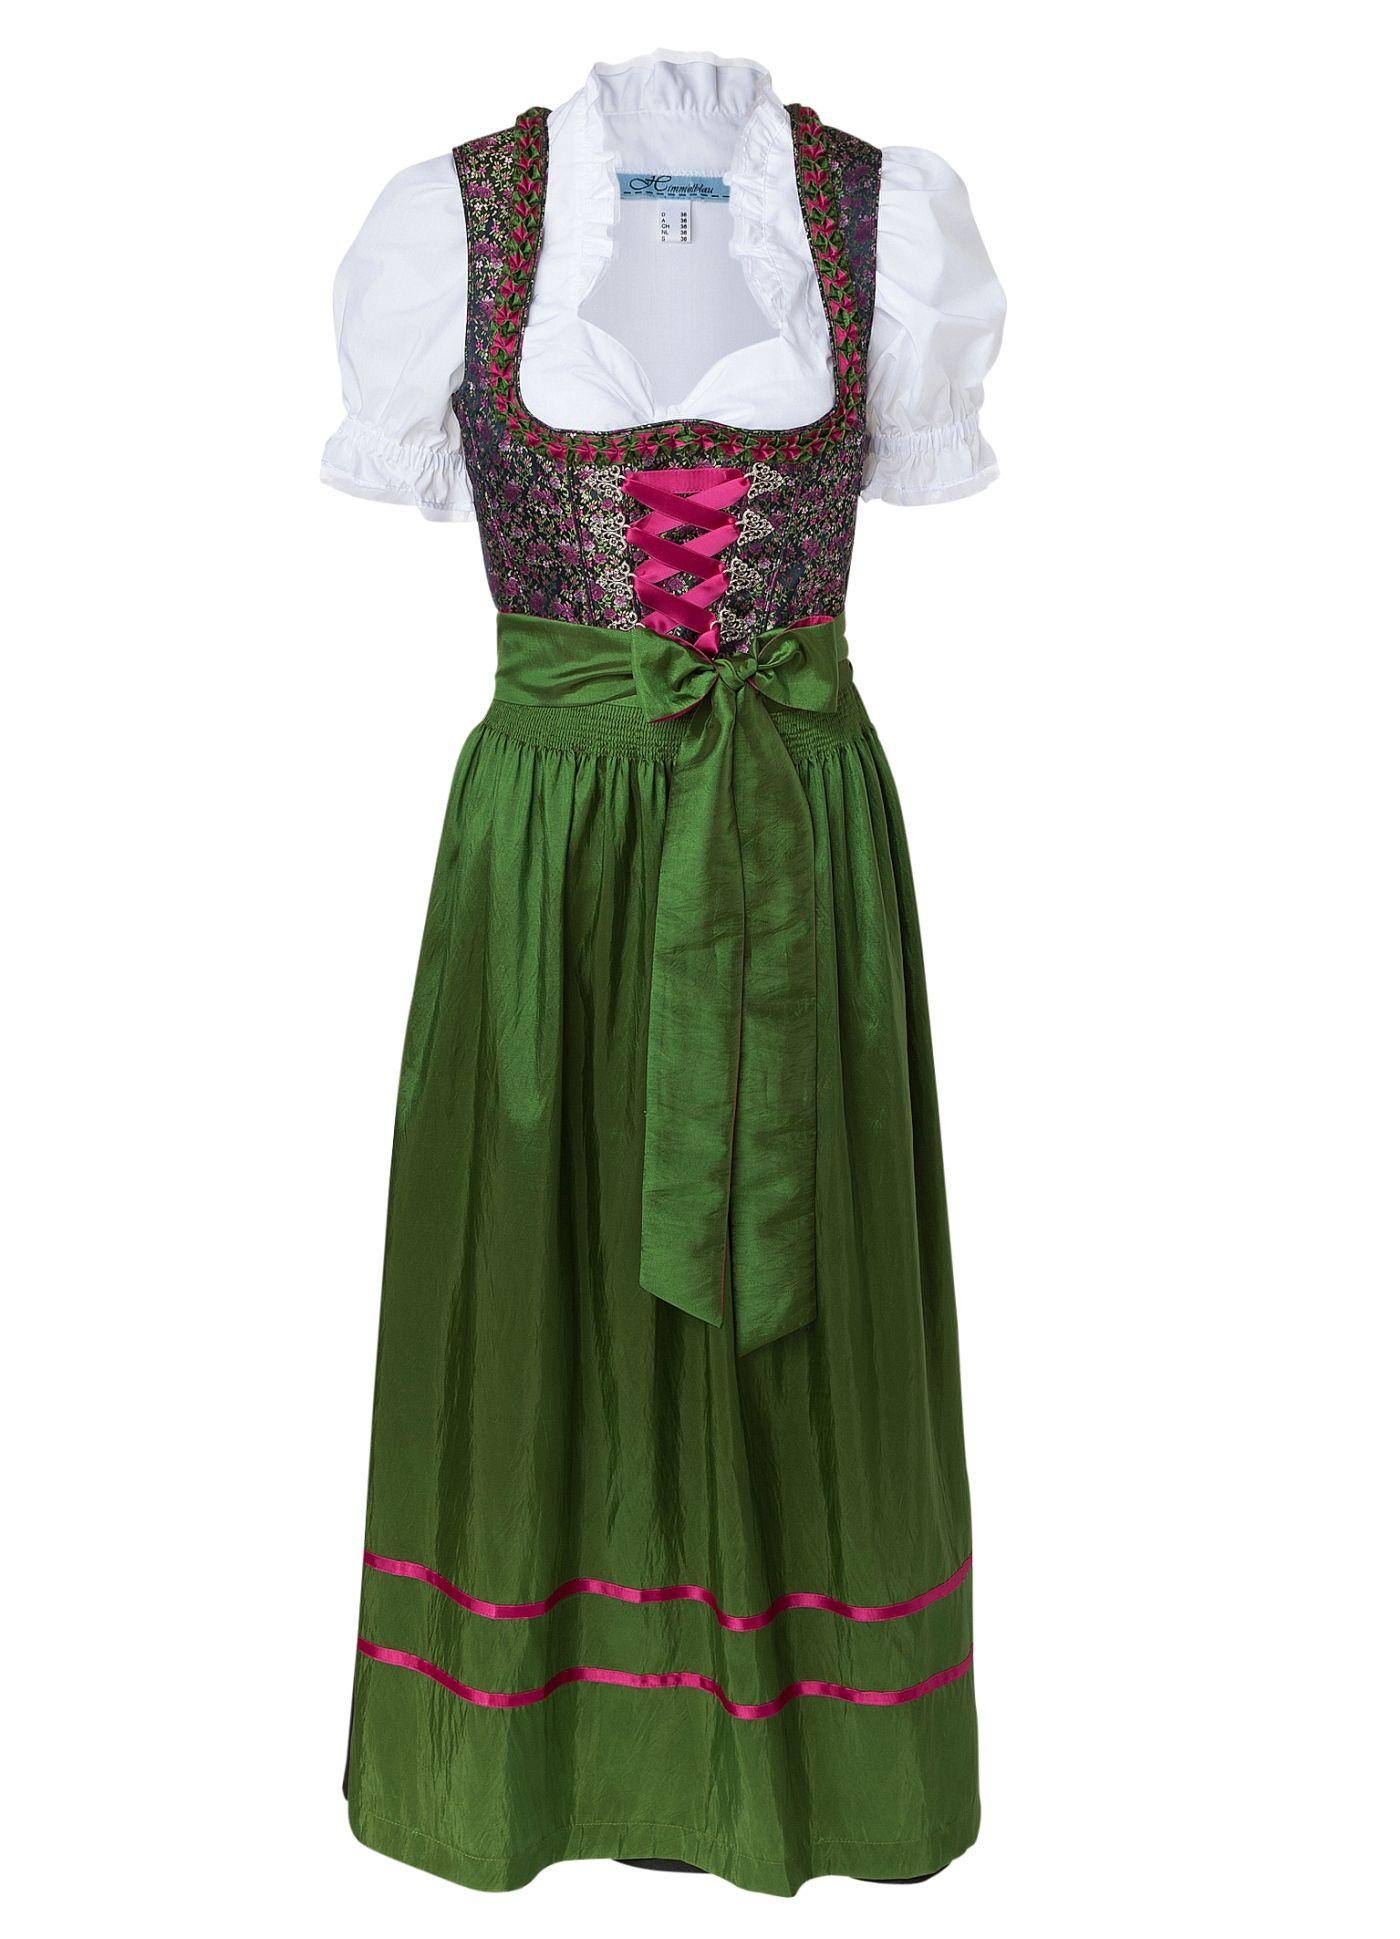 Onlineshop: http://www.hse24.de/Mode/Lola-Paltinger-Dirndl-mit-Blueten-Jacquard-pu51024533.html?mkt=som&refID=pinterest/Mode/Lola-Paltinger&emsrc=socialmedia Trachtenmode Dirndl Kleid #fashion #style #trend #clothing #shopping #dress #wiesn